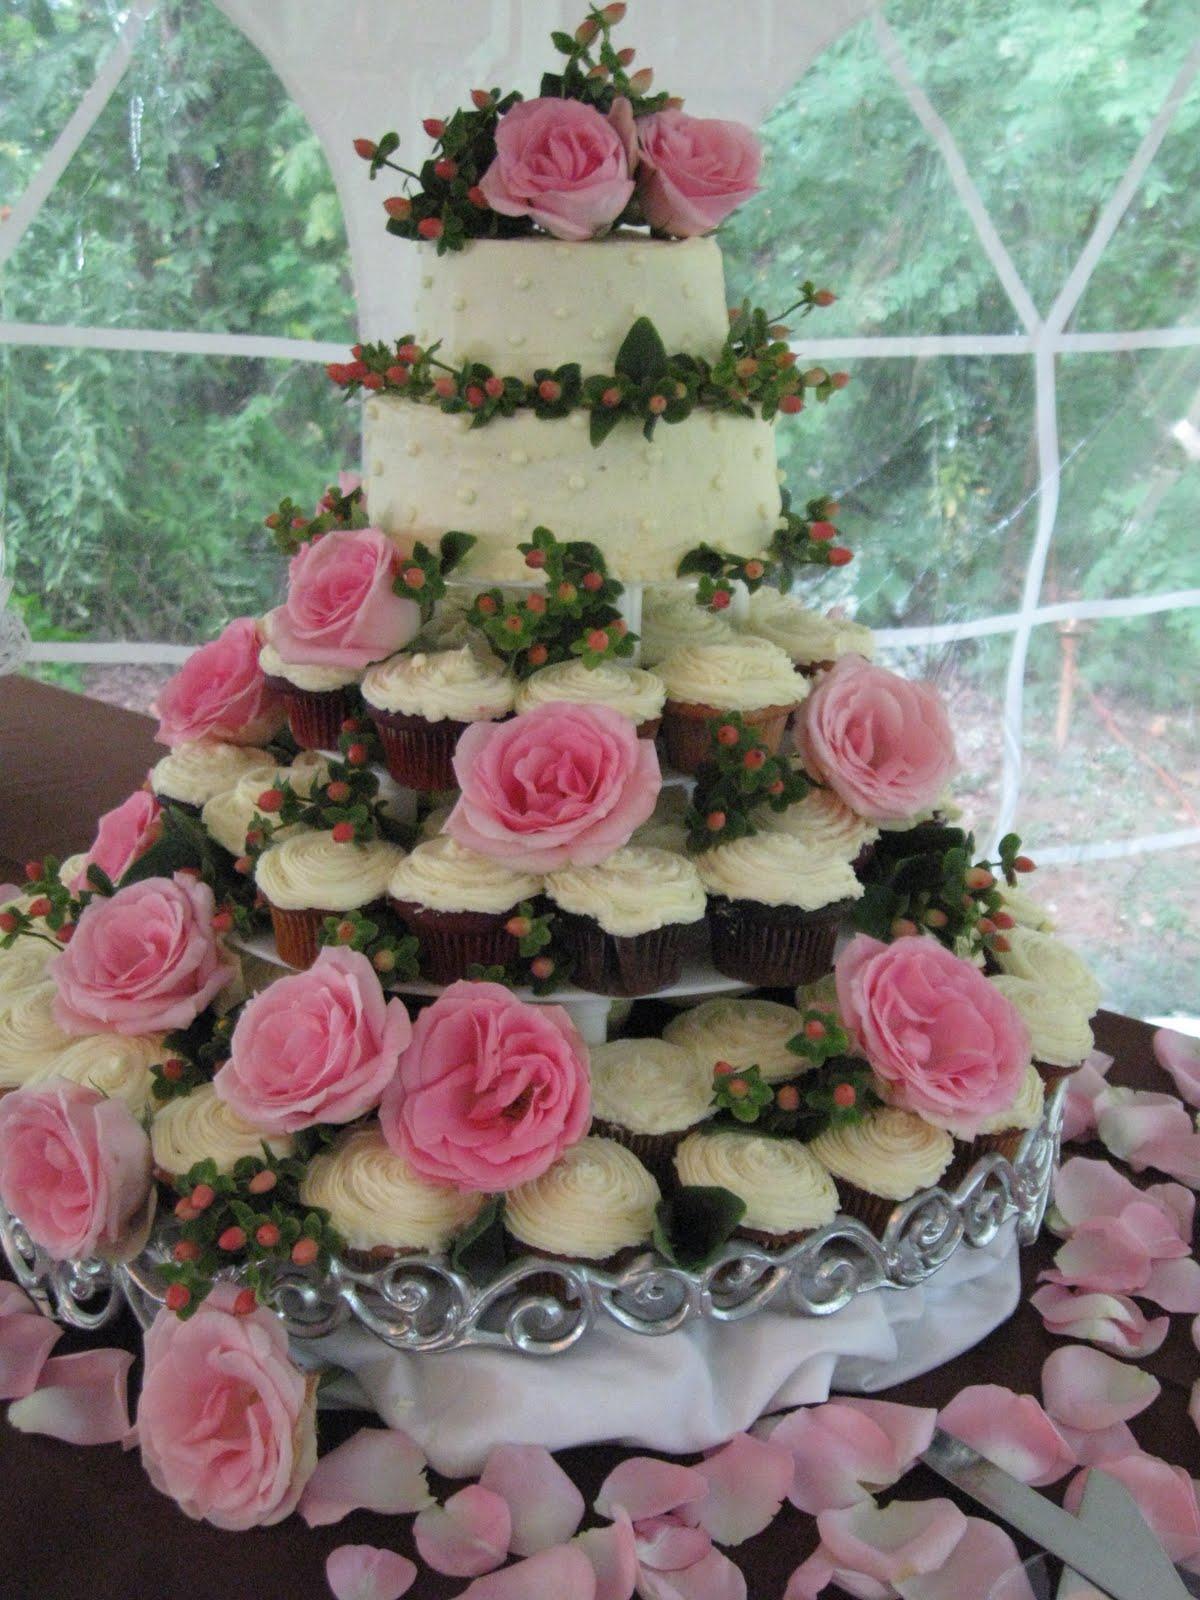 cupcakes for wedding celebration  Cupcakes